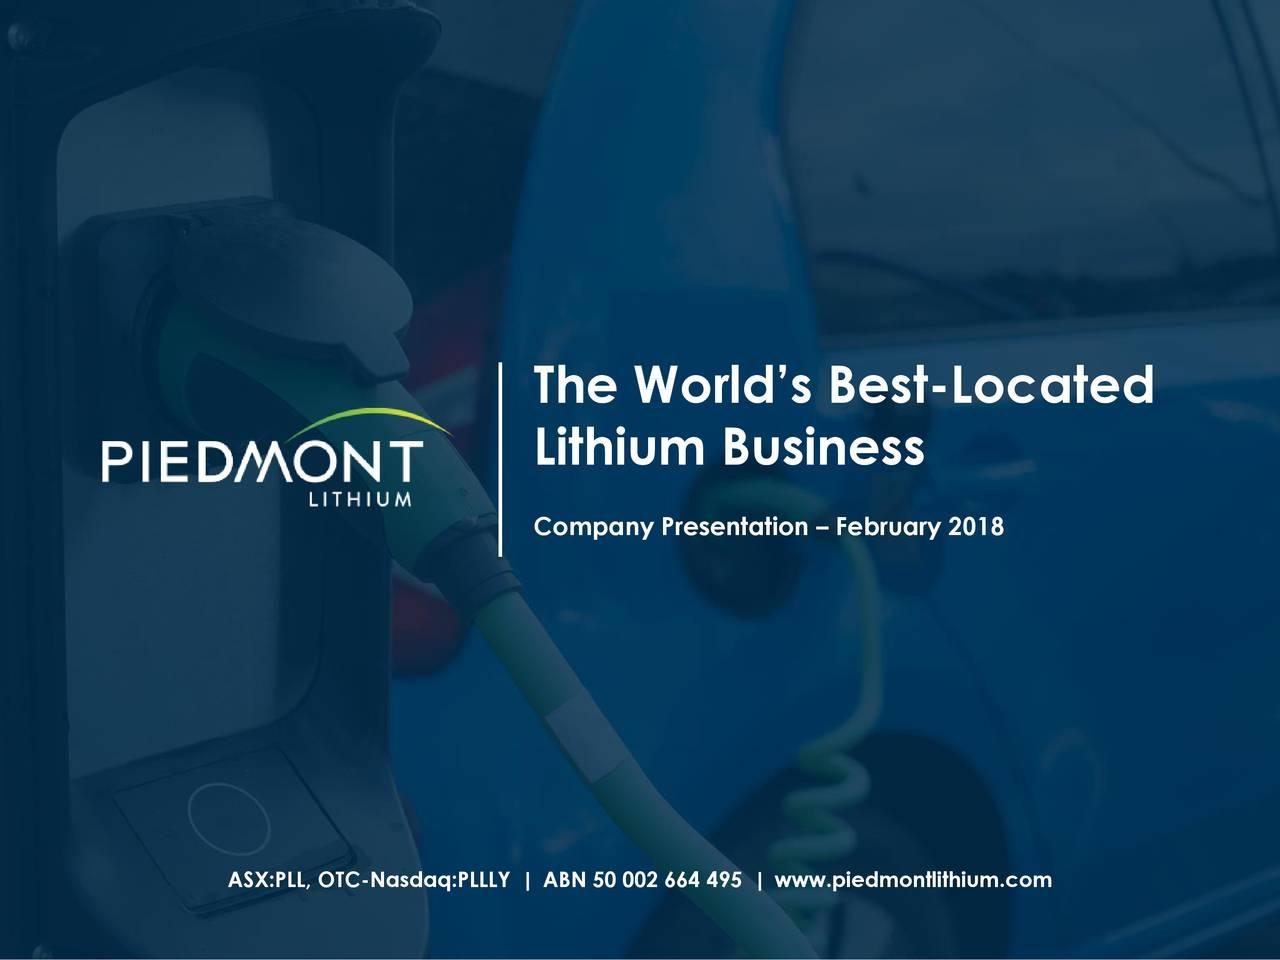 Lithium Business Company Presentation – February 2018 ASX:PLL, OTC-Nasdaq:PLLLY   ABN 50 002 664 495   www.piedmontlithium.com